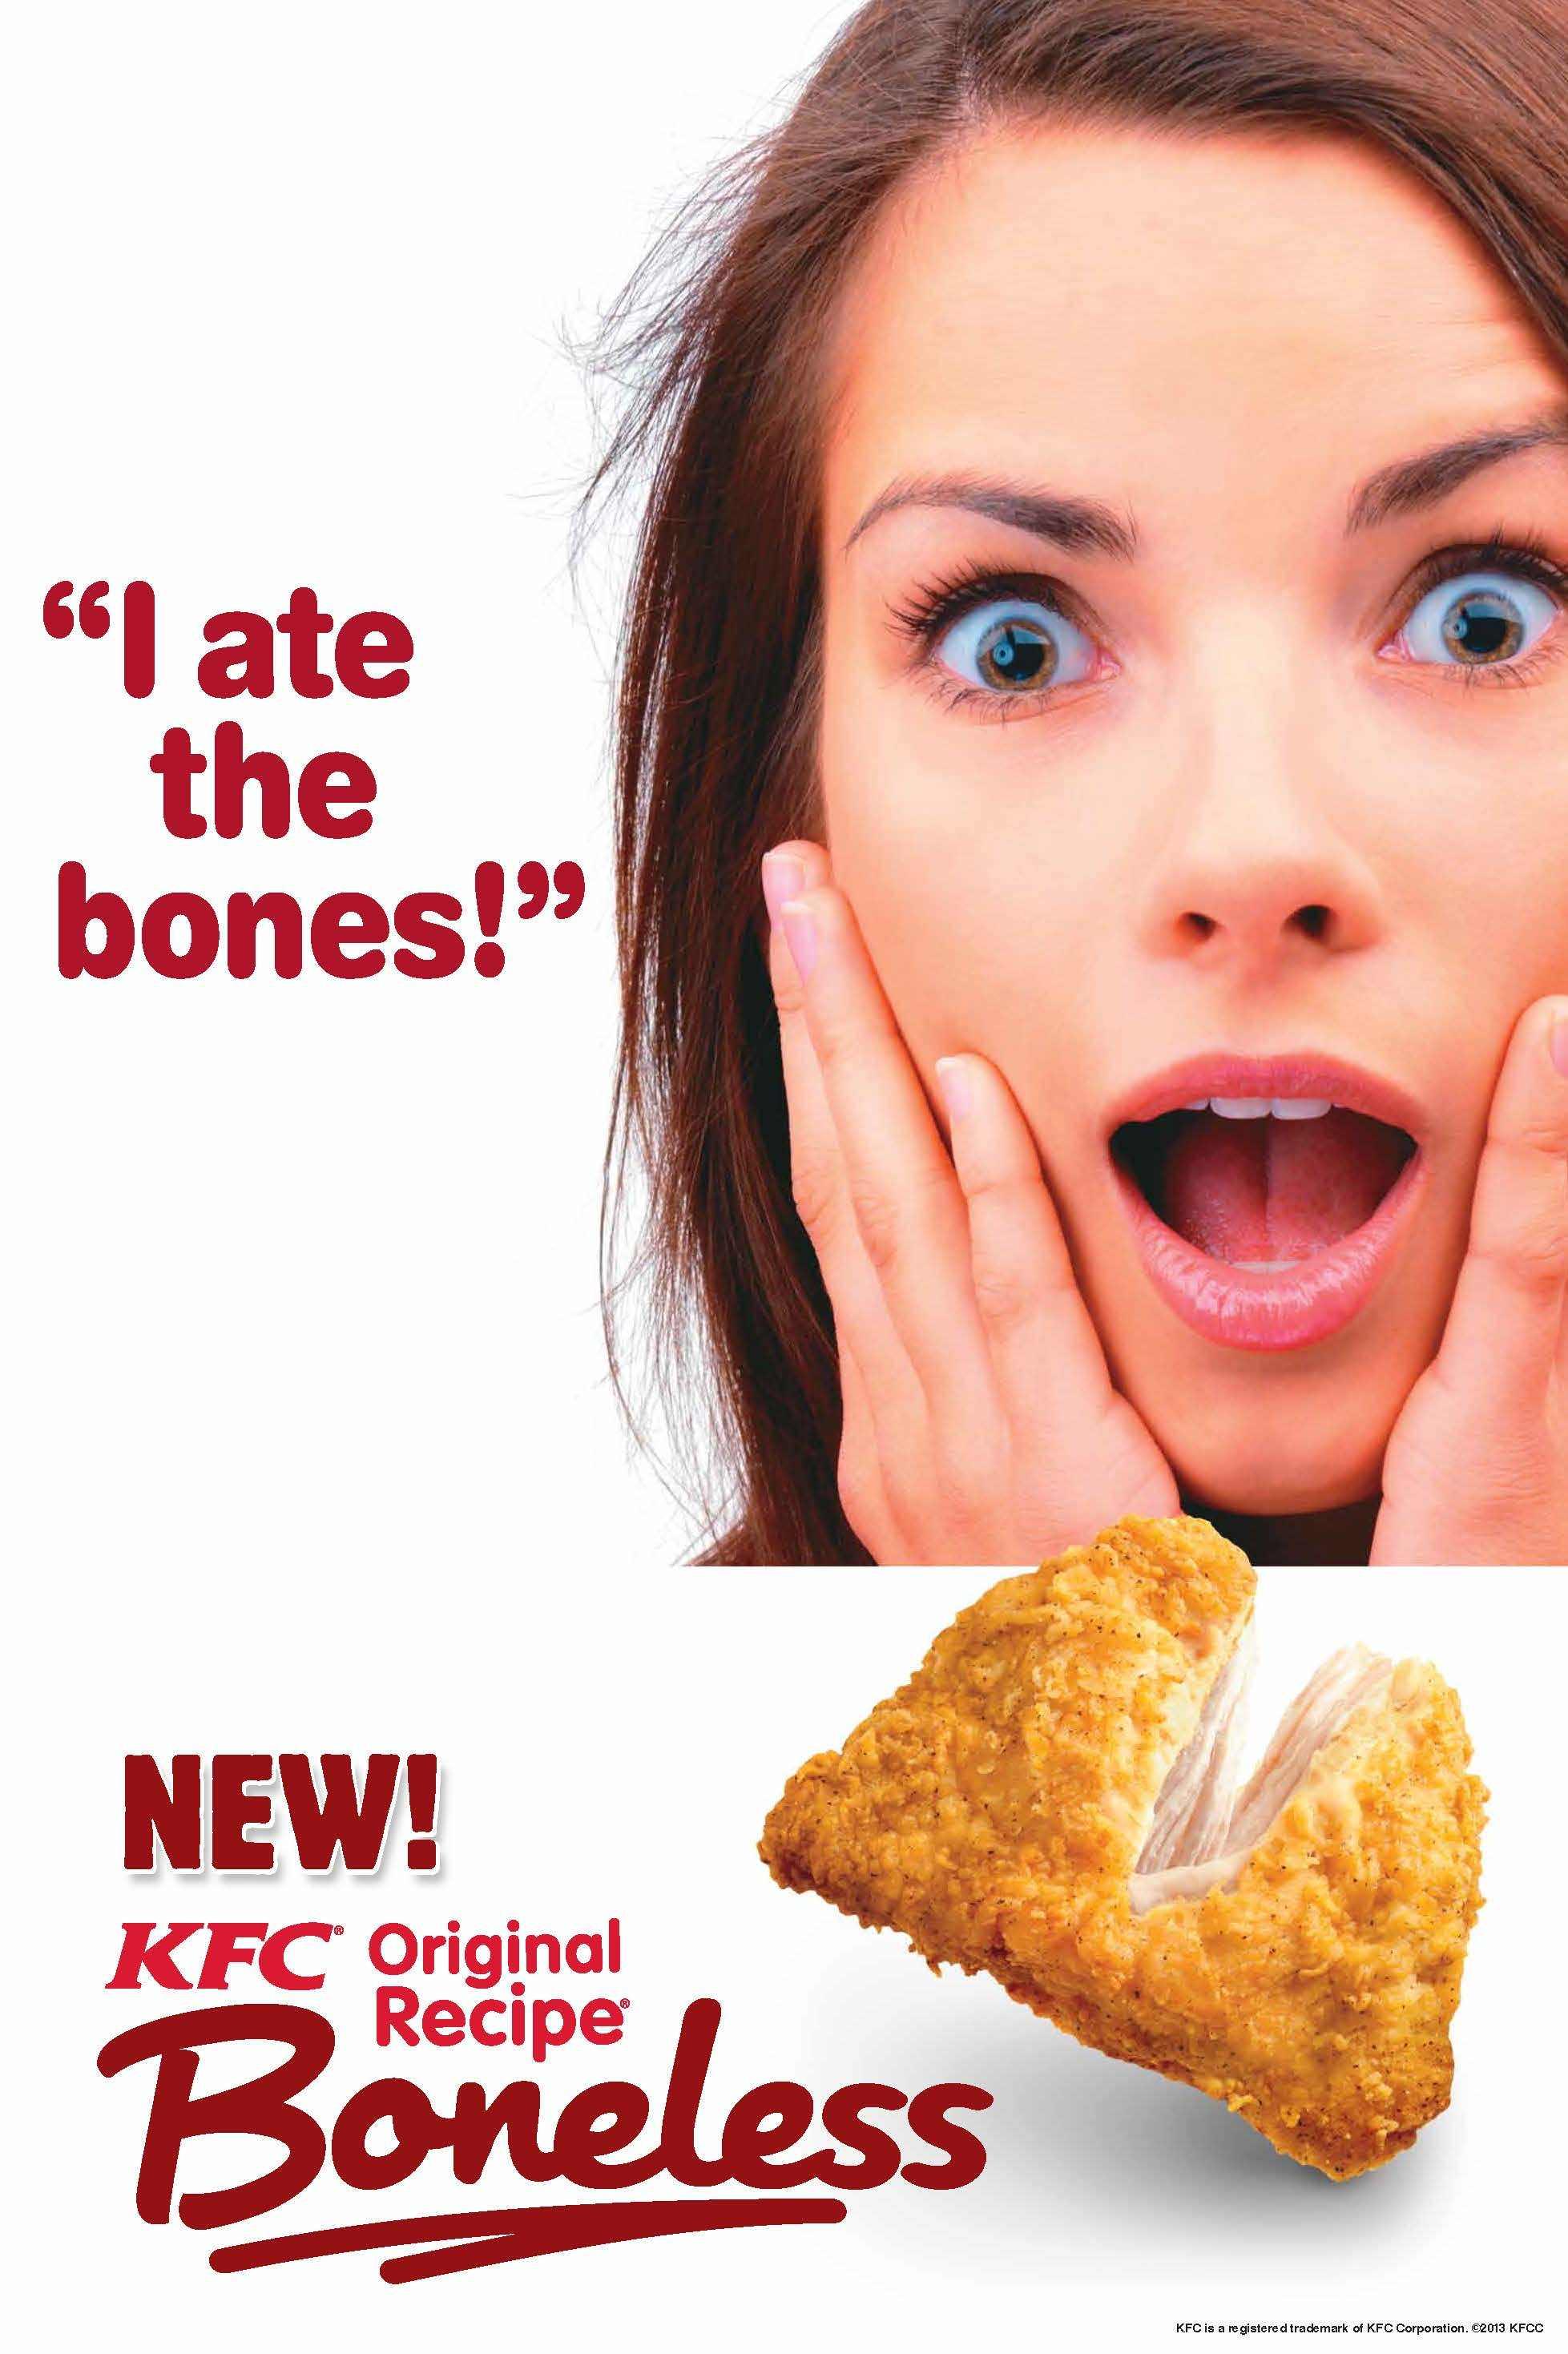 I ate the bones?! - Drawception